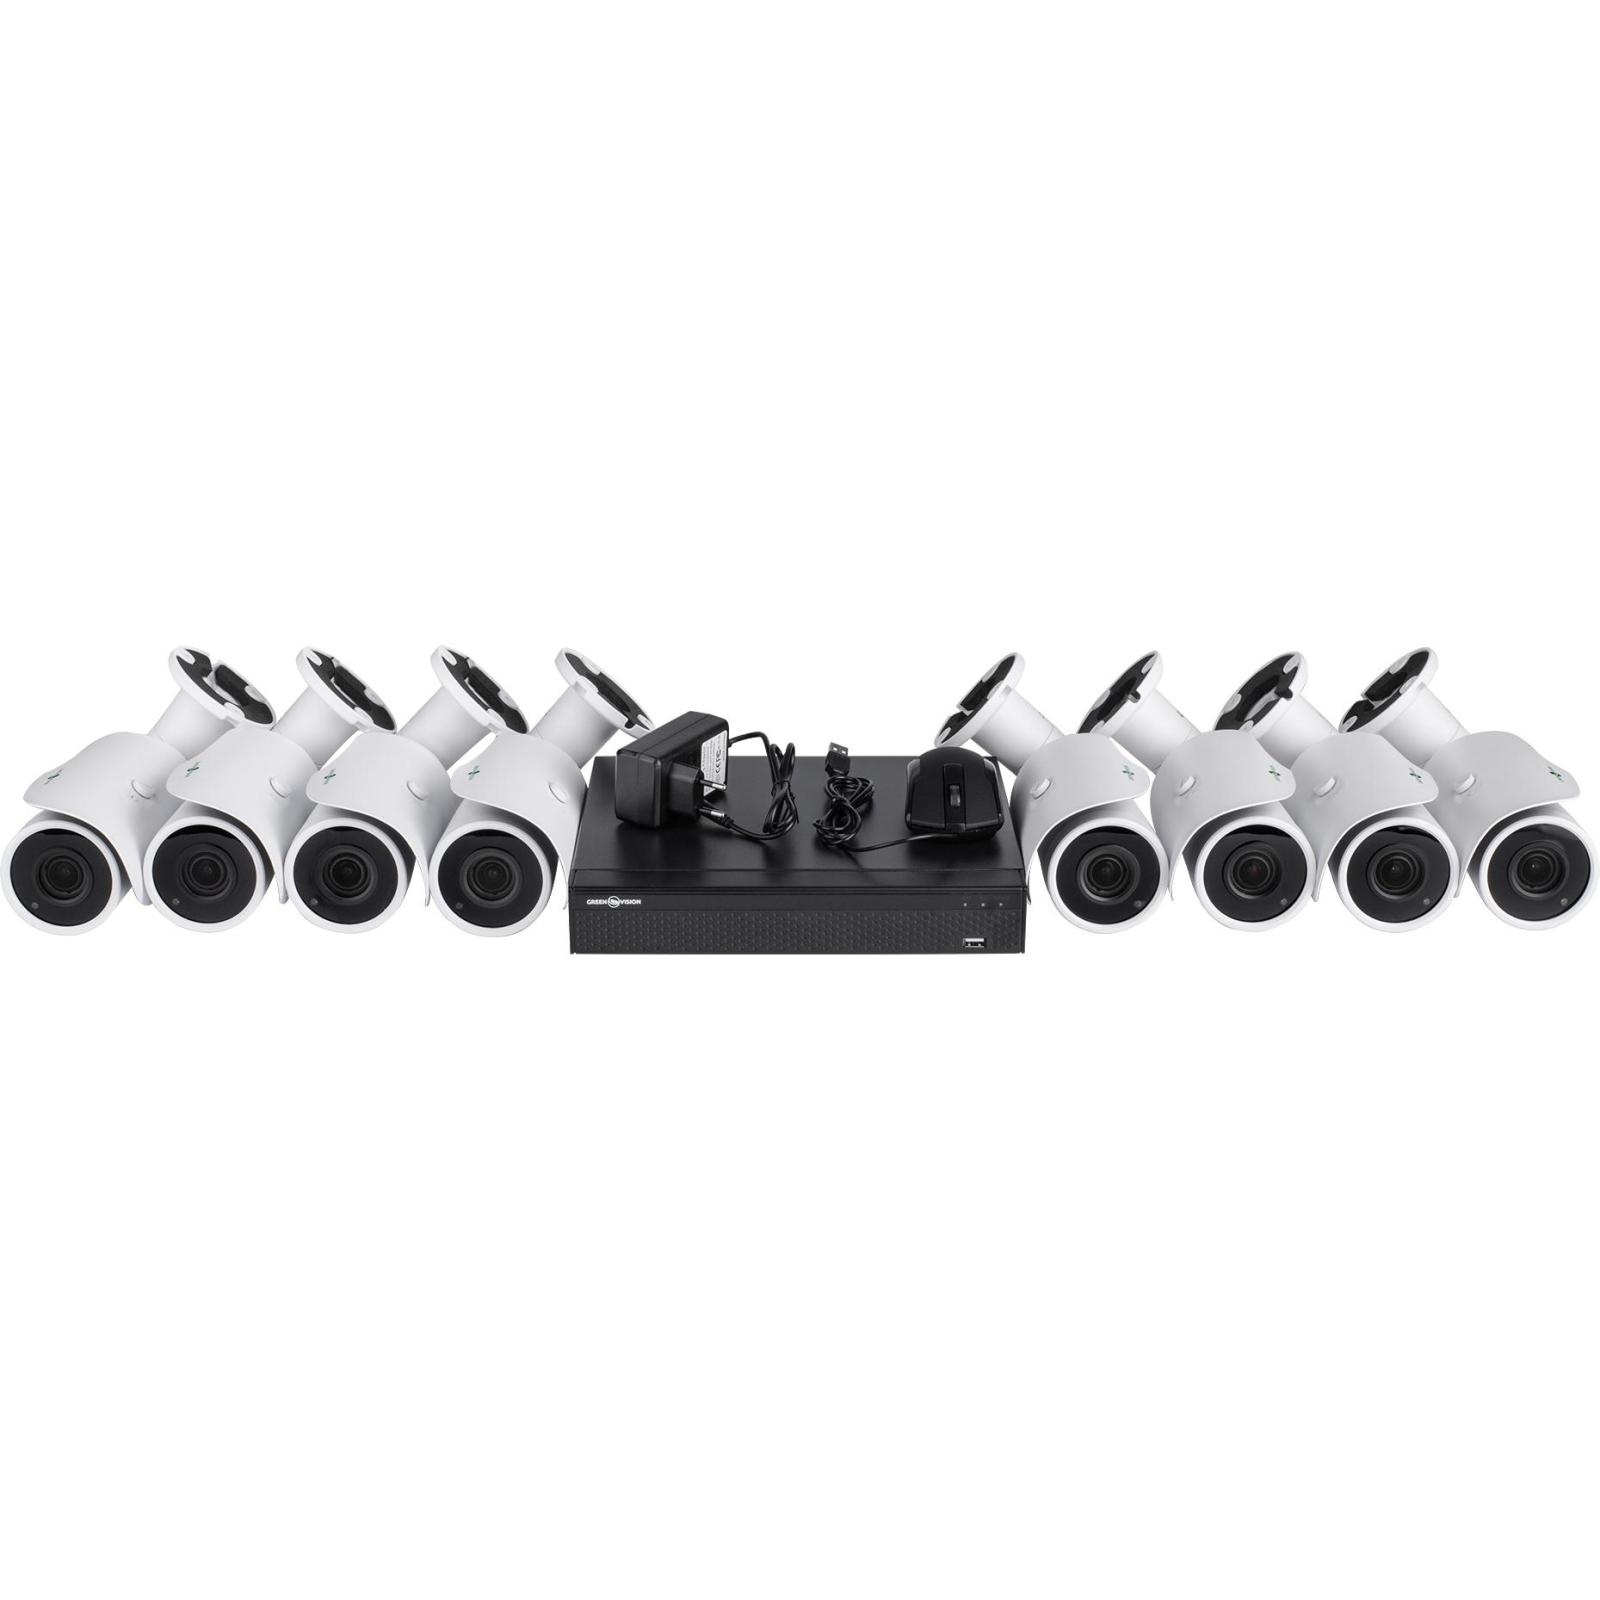 Комплект видеонаблюдения Greenvision GV-IP-K-L20/08 1080P (6752)